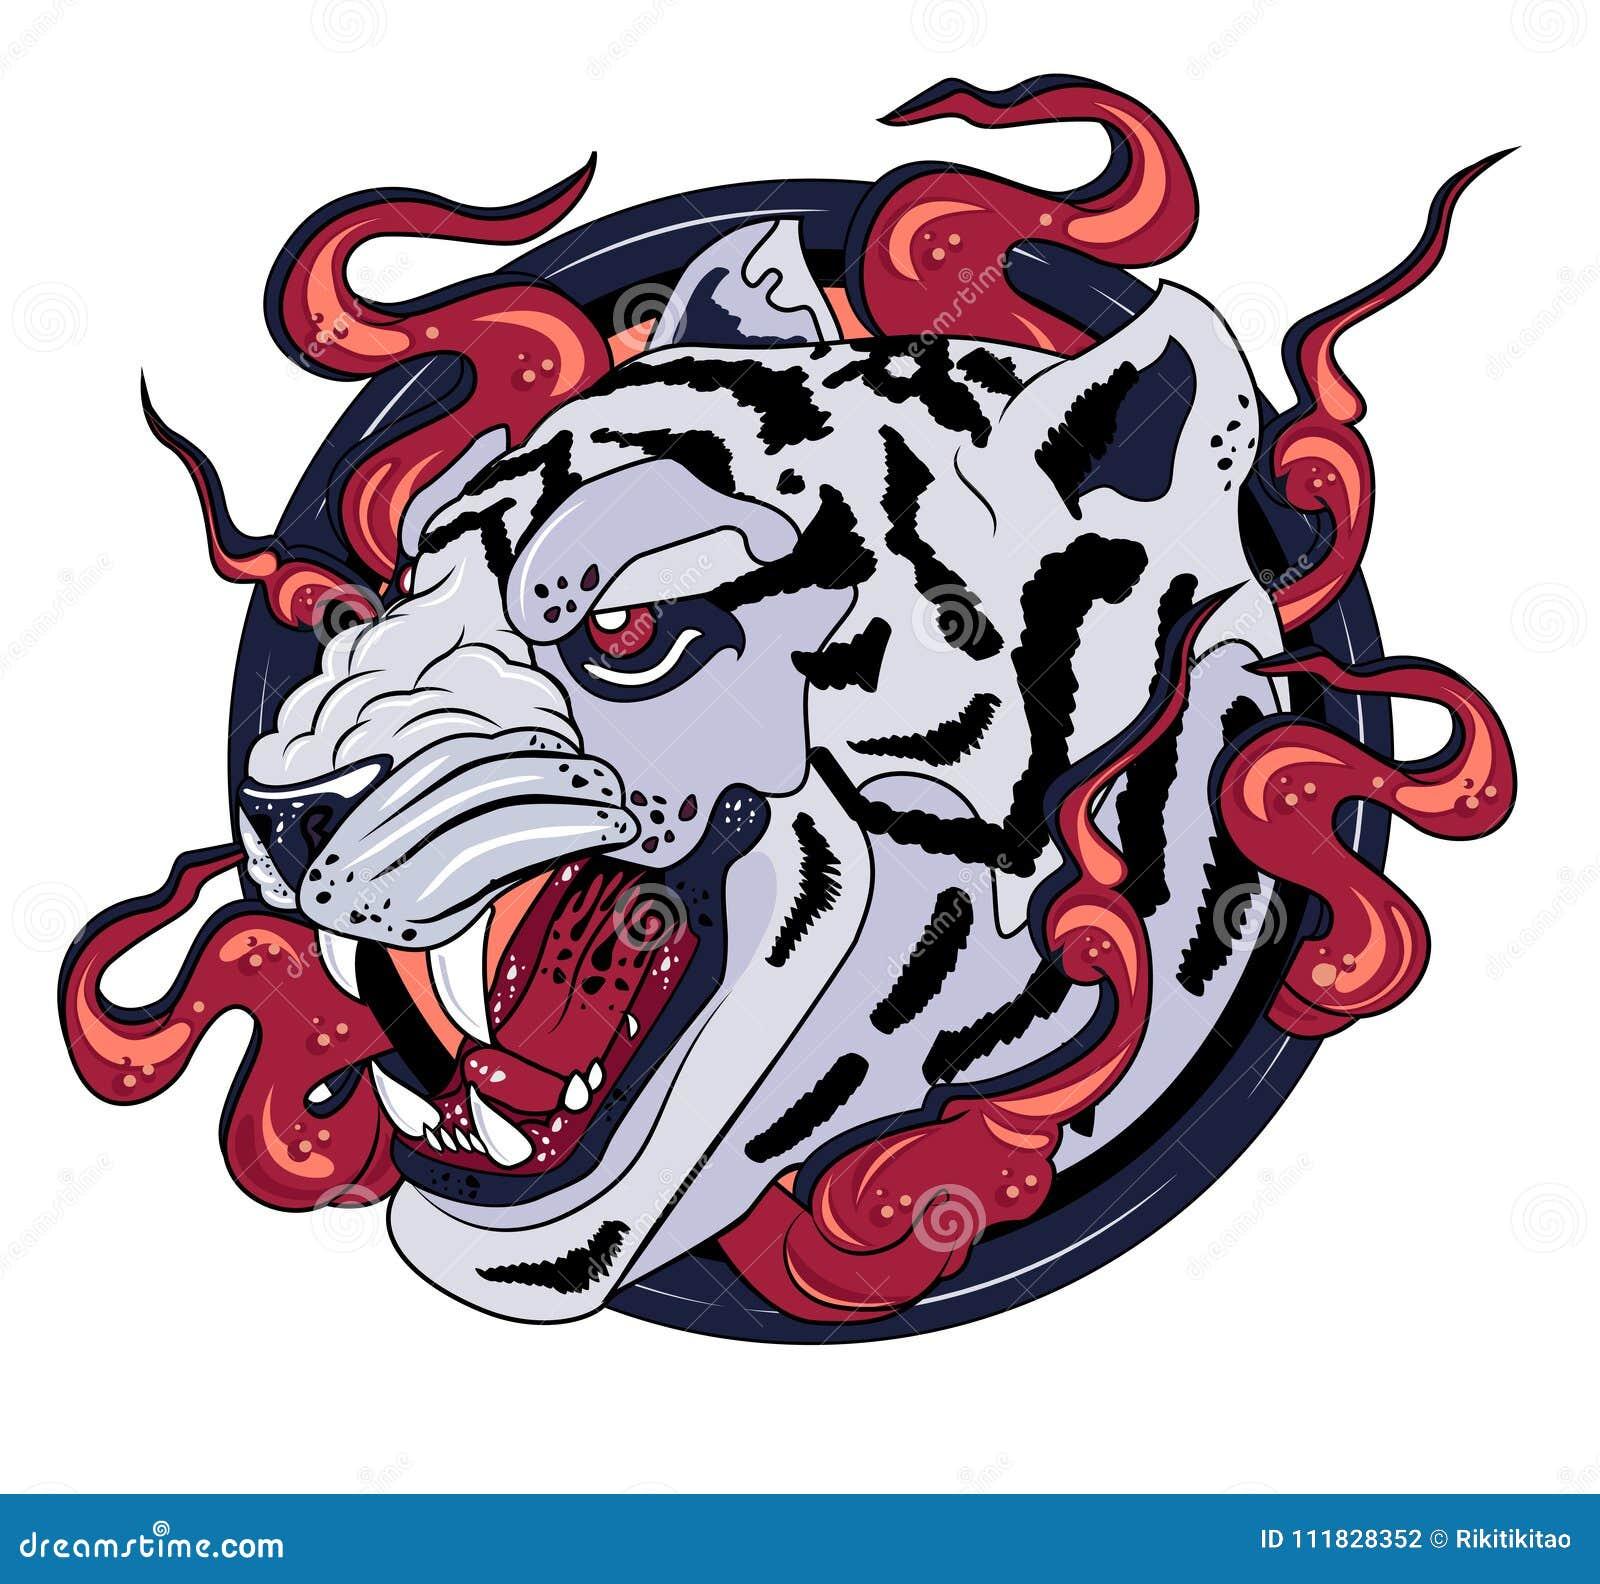 8760961d2 White tiger print logo stock vector. Illustration of face - 111828352